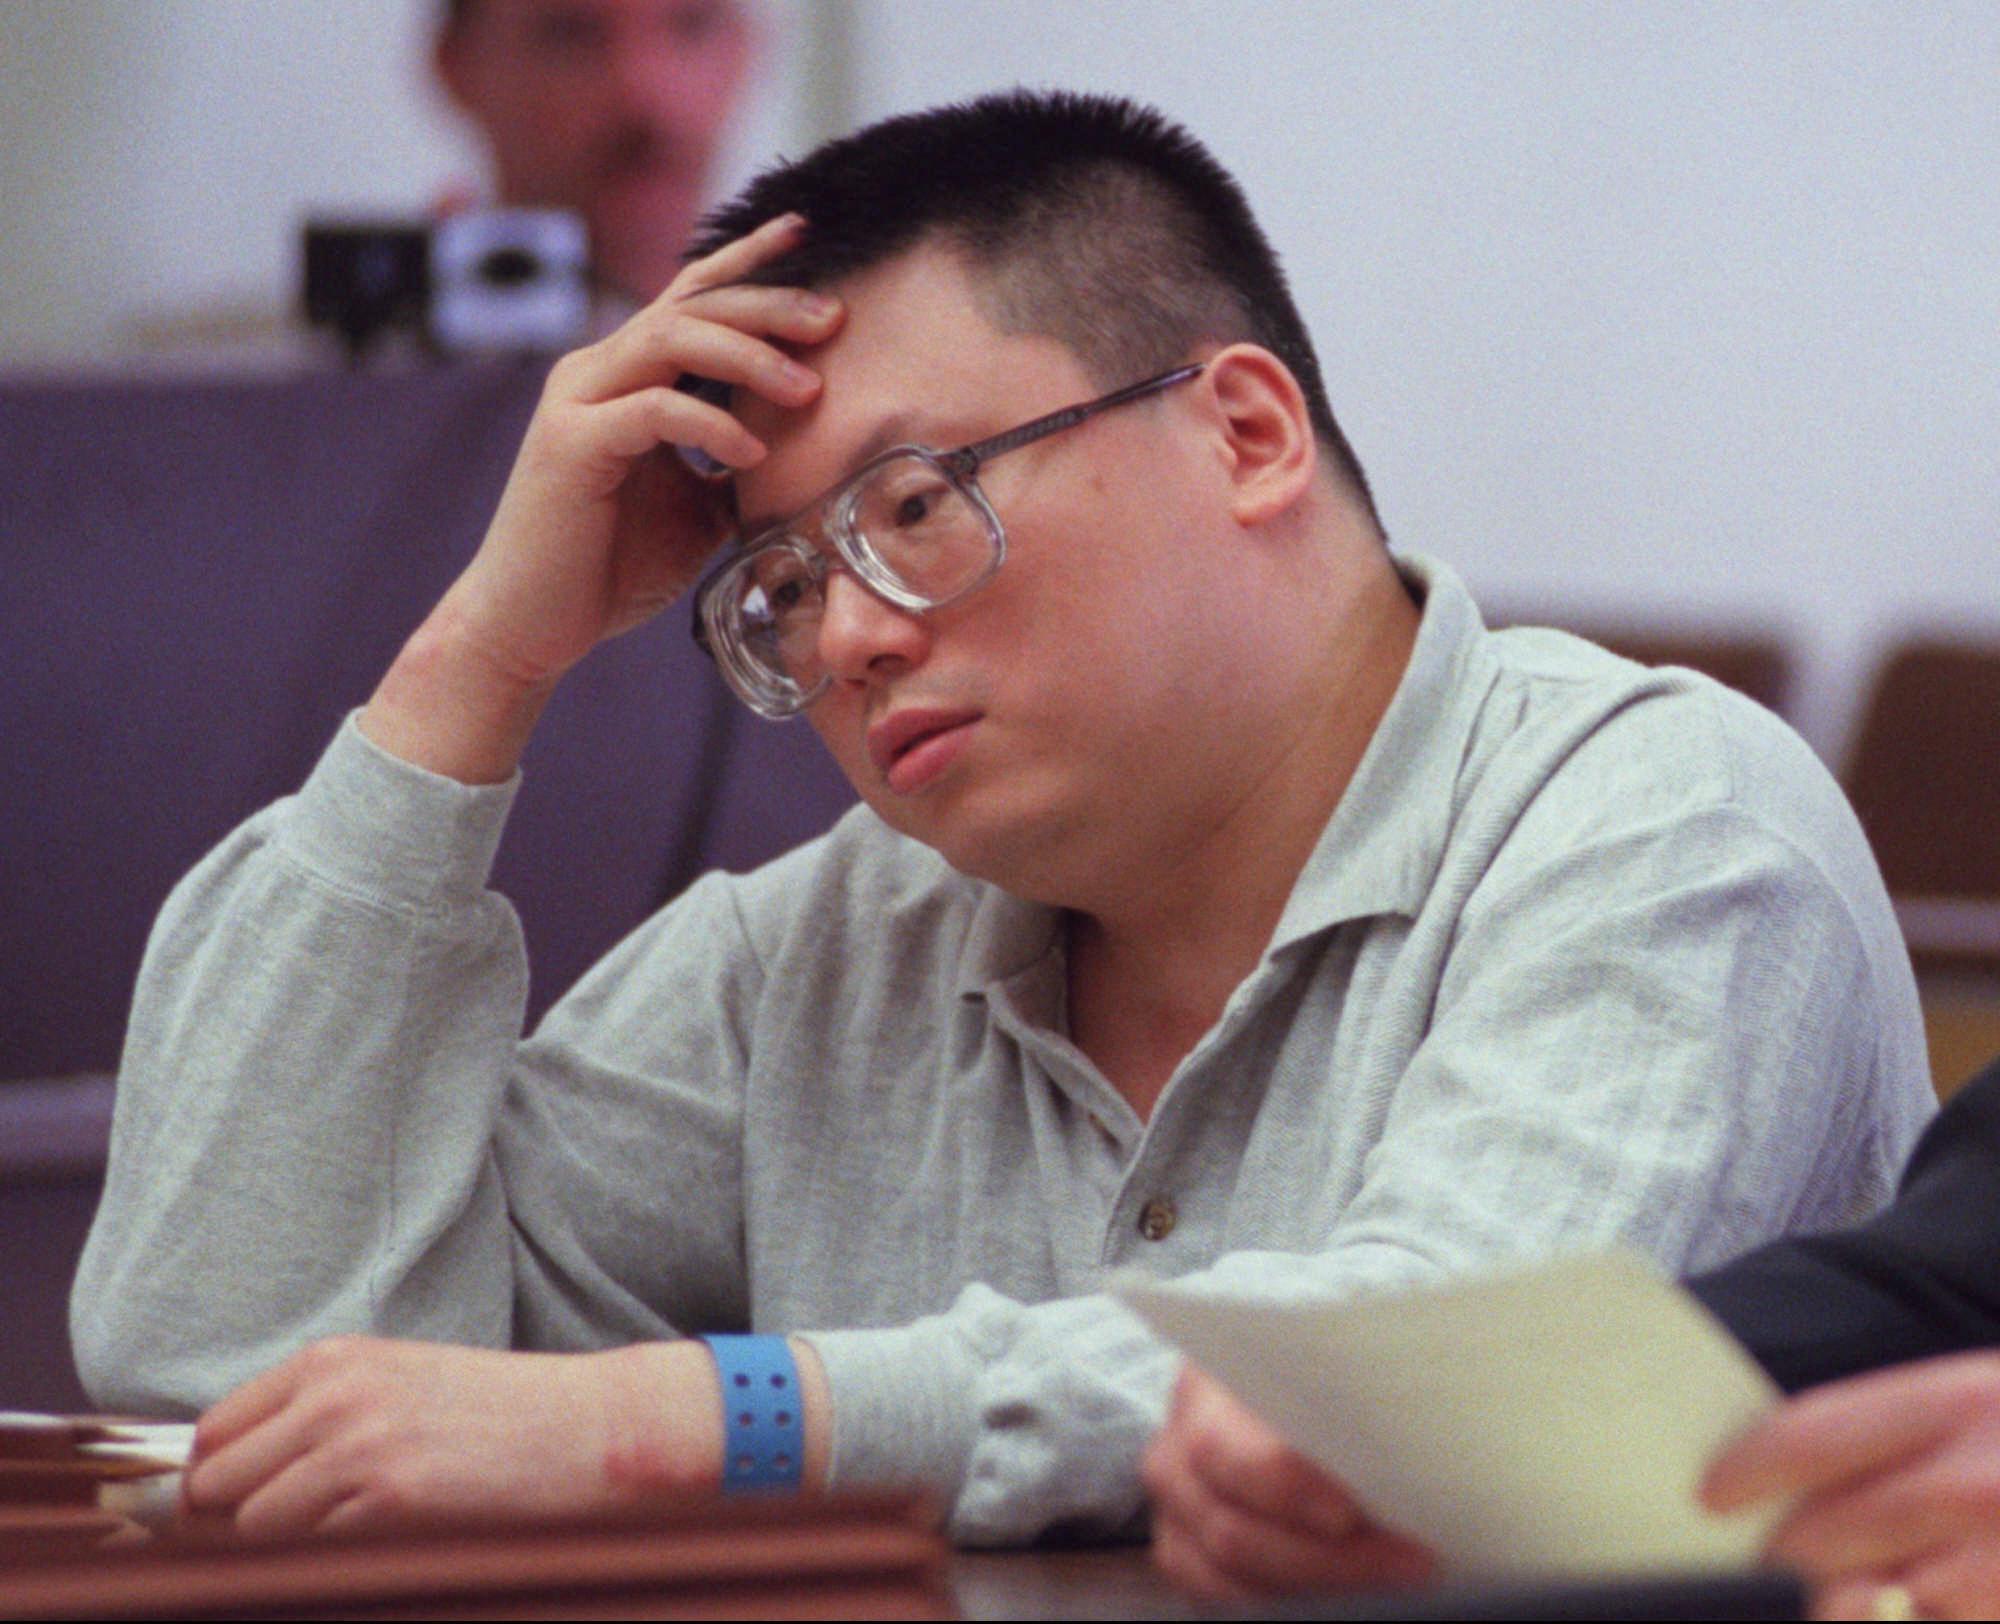 چارلز اِنگ؛ قاتل سریالی ملقب به «سگ دیوانه» که اعتیادش به سرقت کار دستش داد